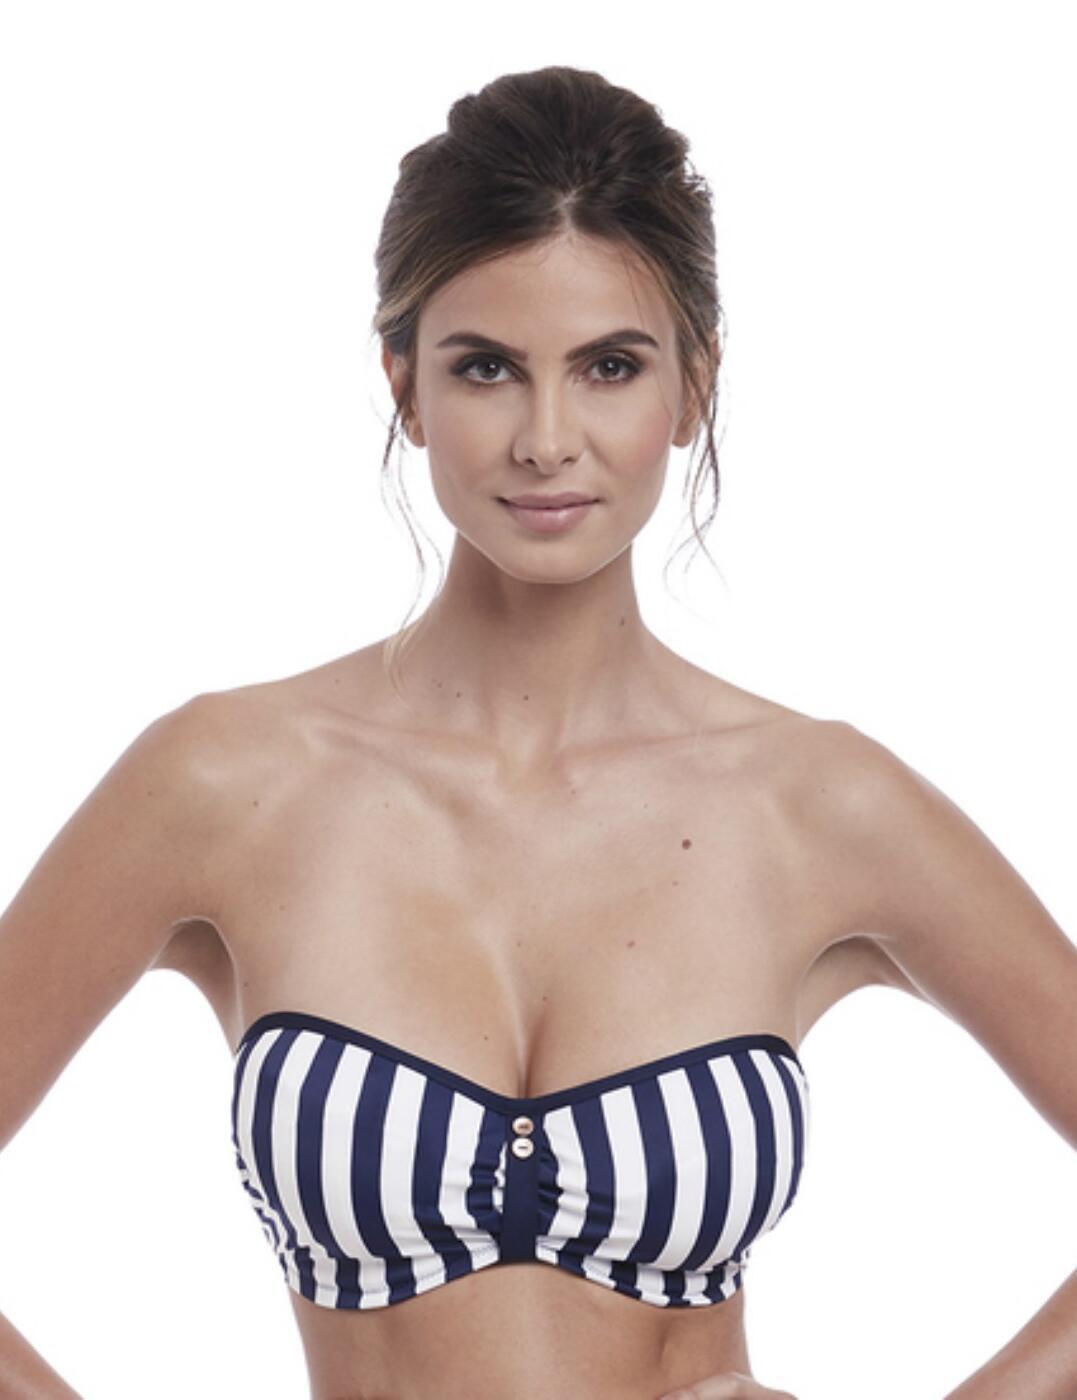 6743 Fantasie Cote D Azur Strapless Bikini Top - 6743 Ink